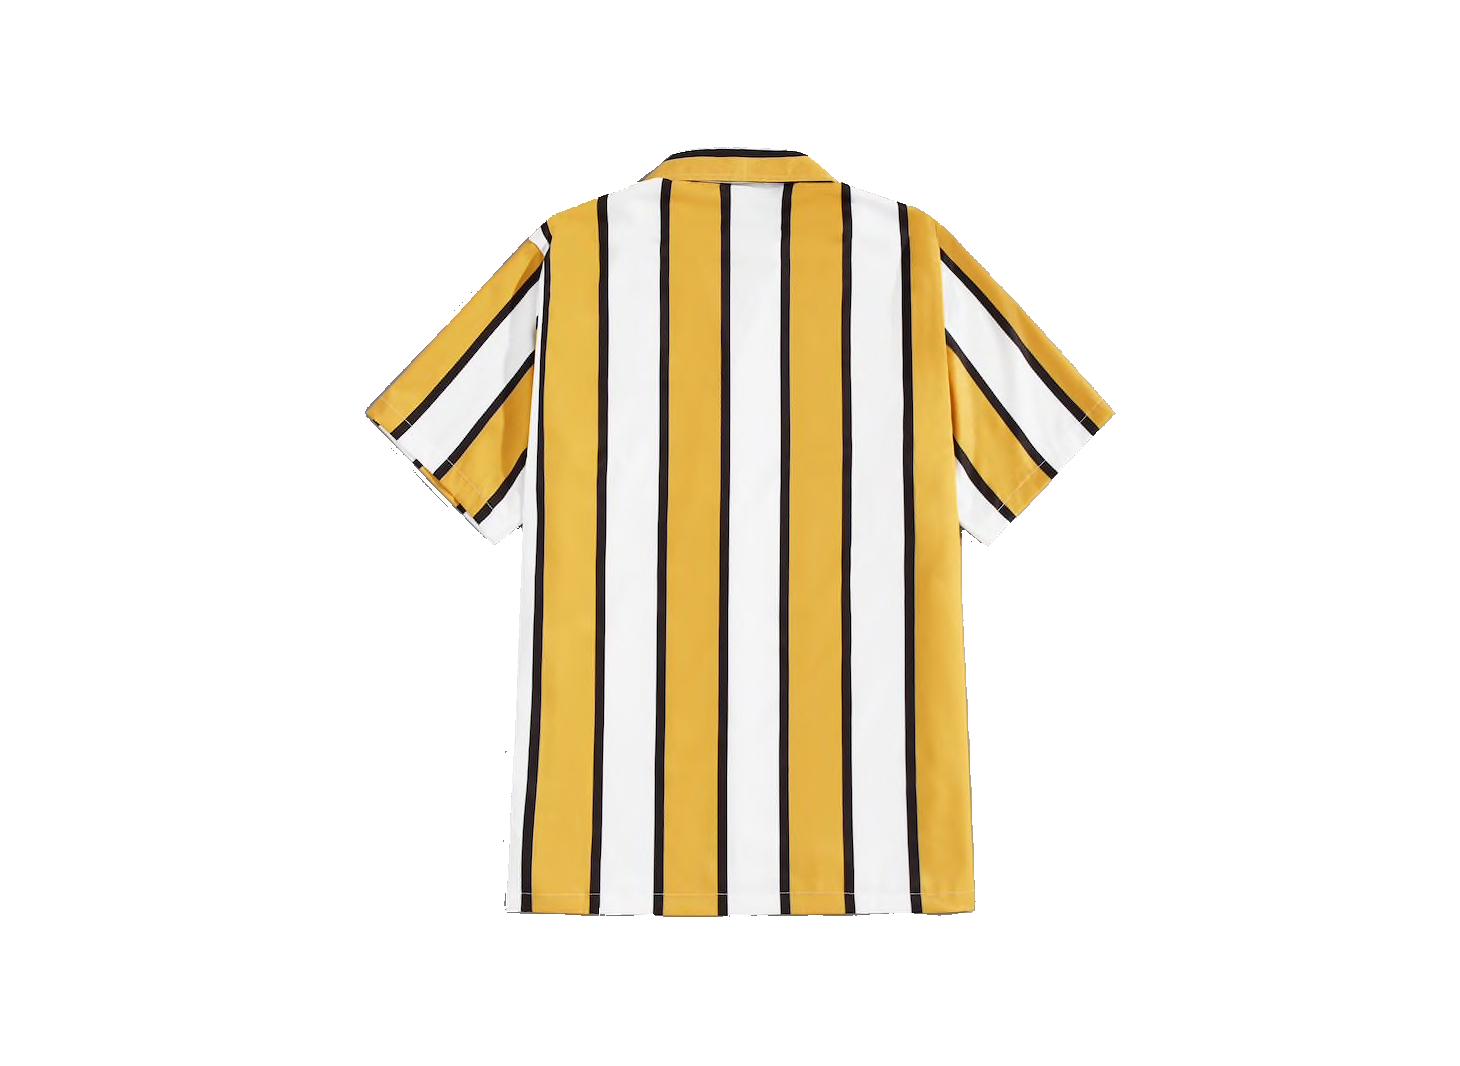 Collard Shirt [BACK].png